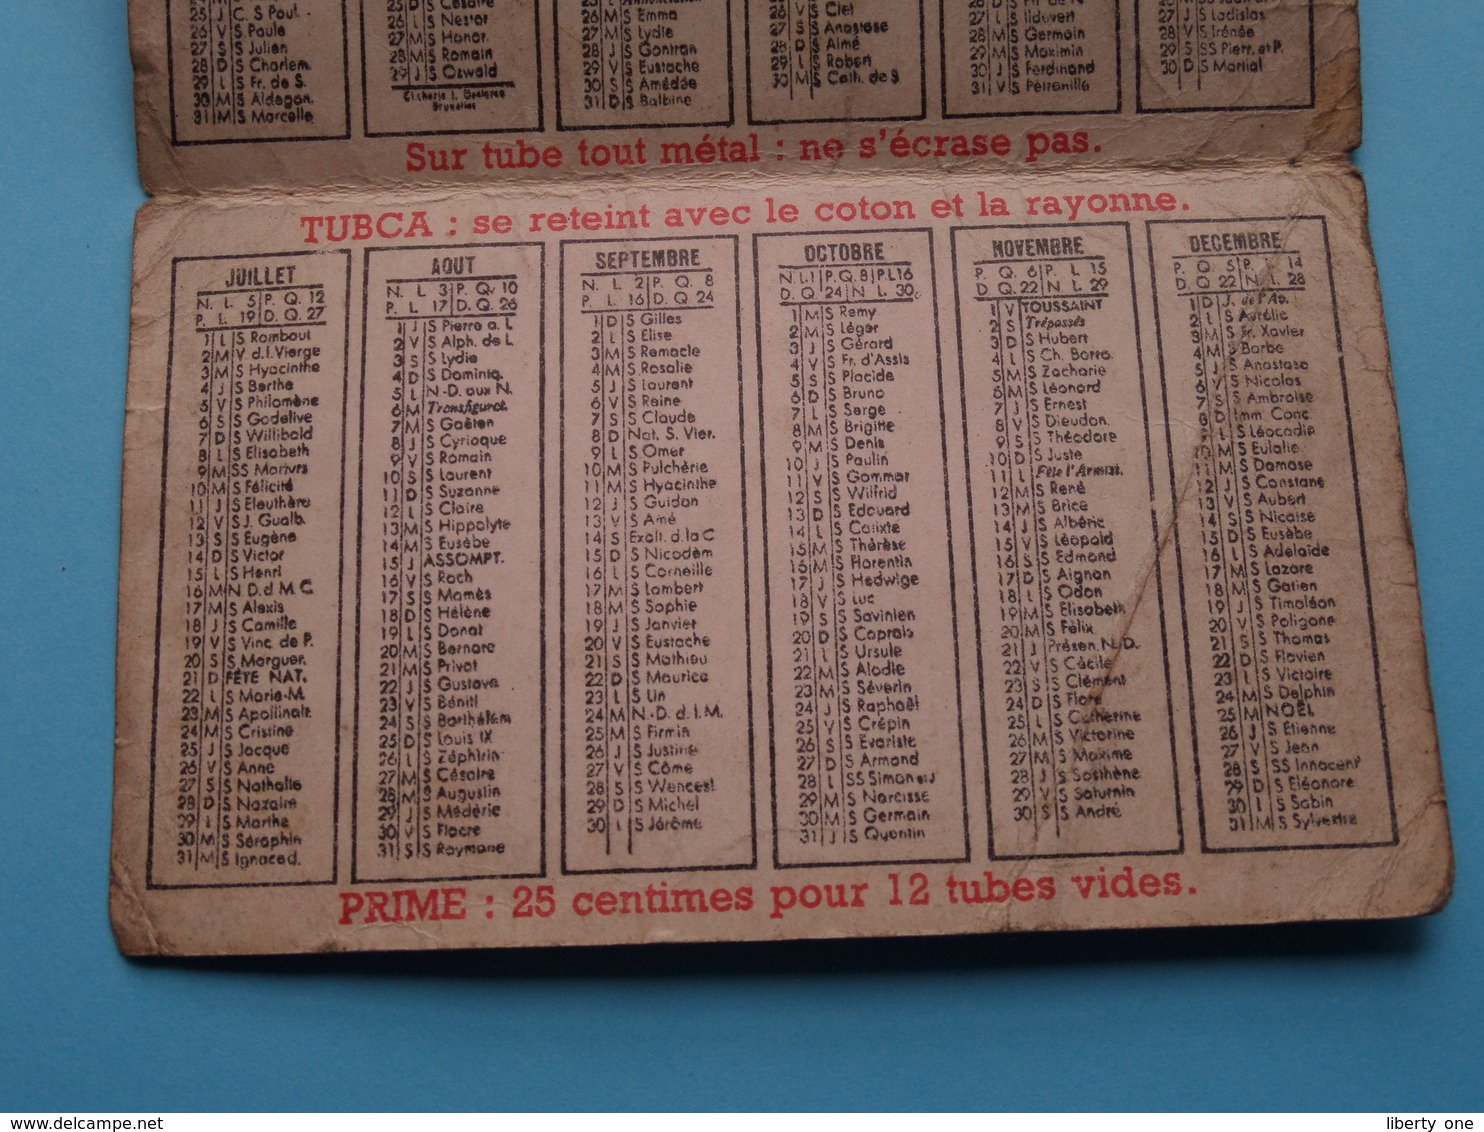 1940 ( TUBOR - 1940 - TUBCA > 100 % Belge ) Calendrier ( Gekreukt / Vuil > Zie/voir Photo Pour/voor Detail ) ! - Calendars